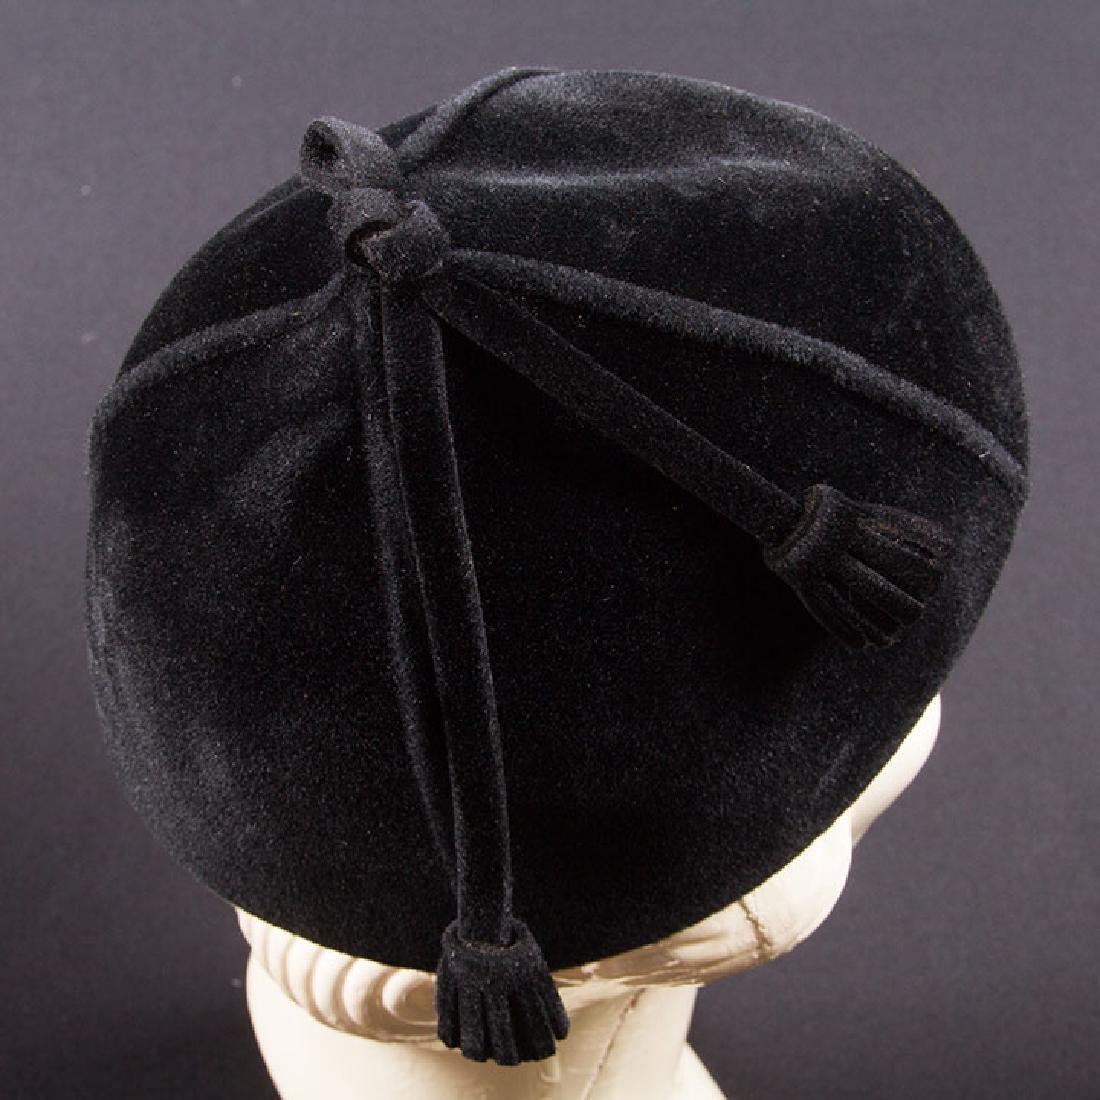 5 LADIES' BLACK HATS, LATE 1930s - 4